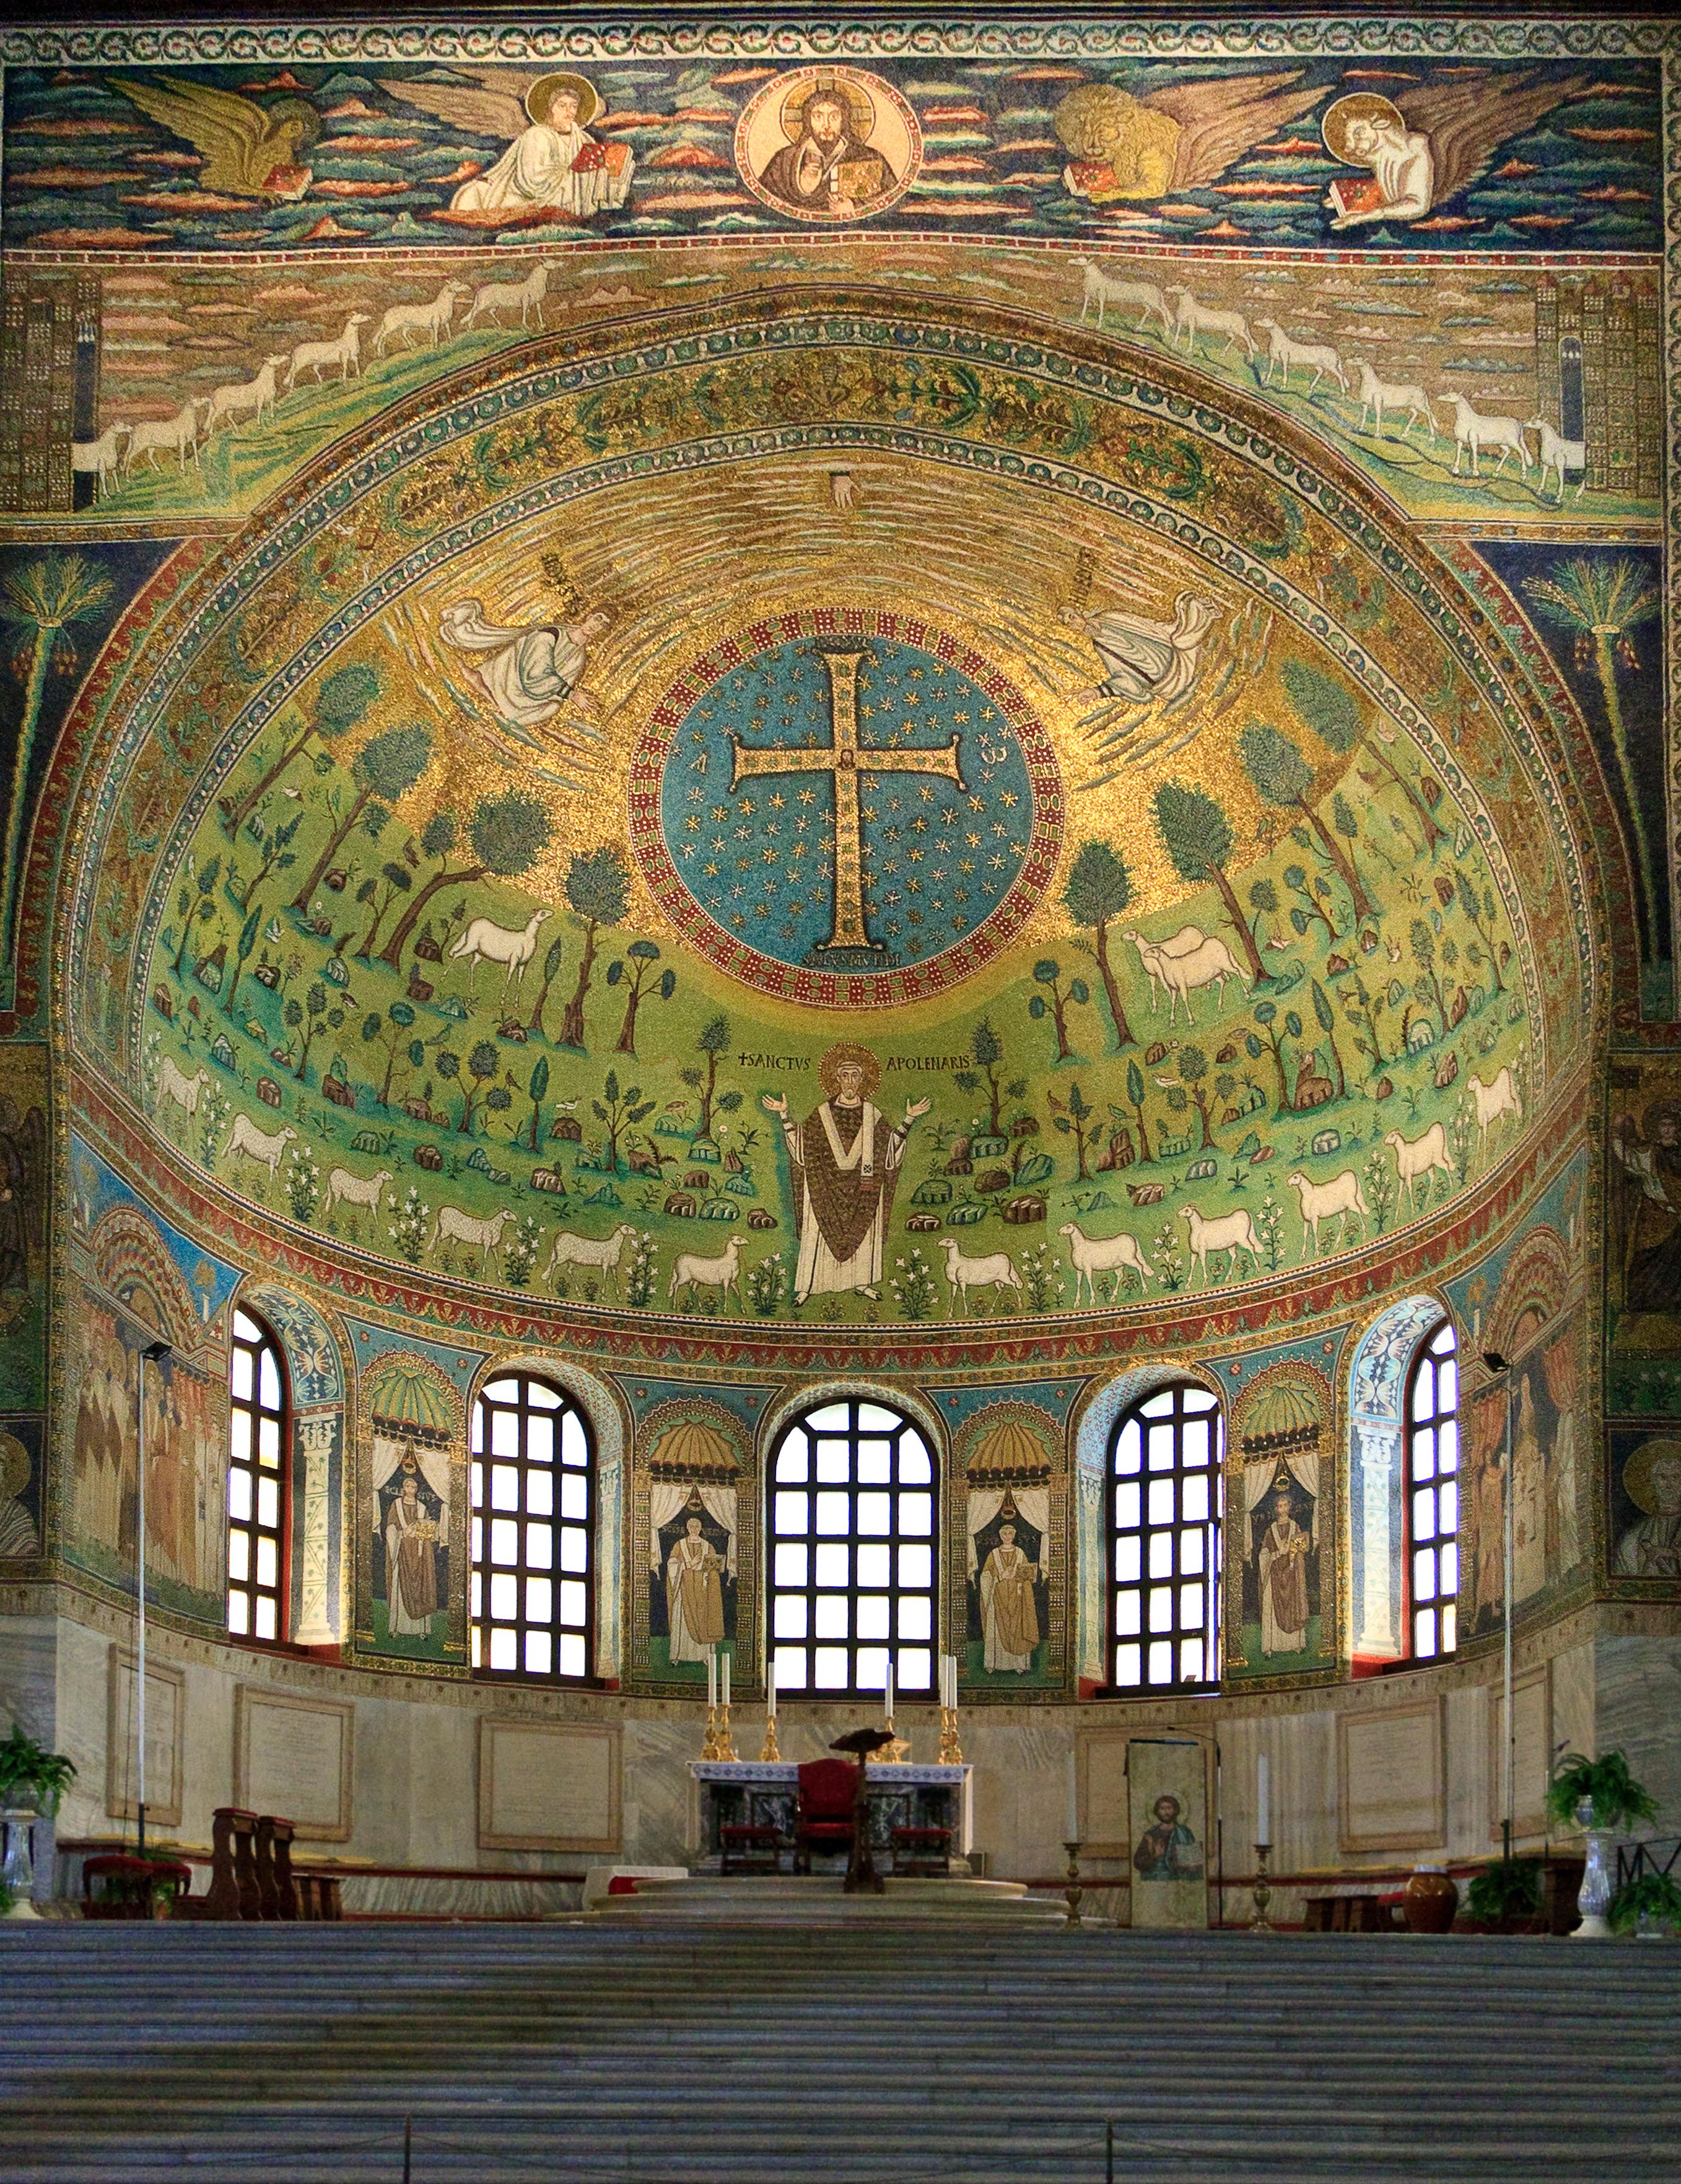 https://upload.wikimedia.org/wikipedia/commons/e/e6/Ravenna_SantApollinare_Classe_0115.jpg